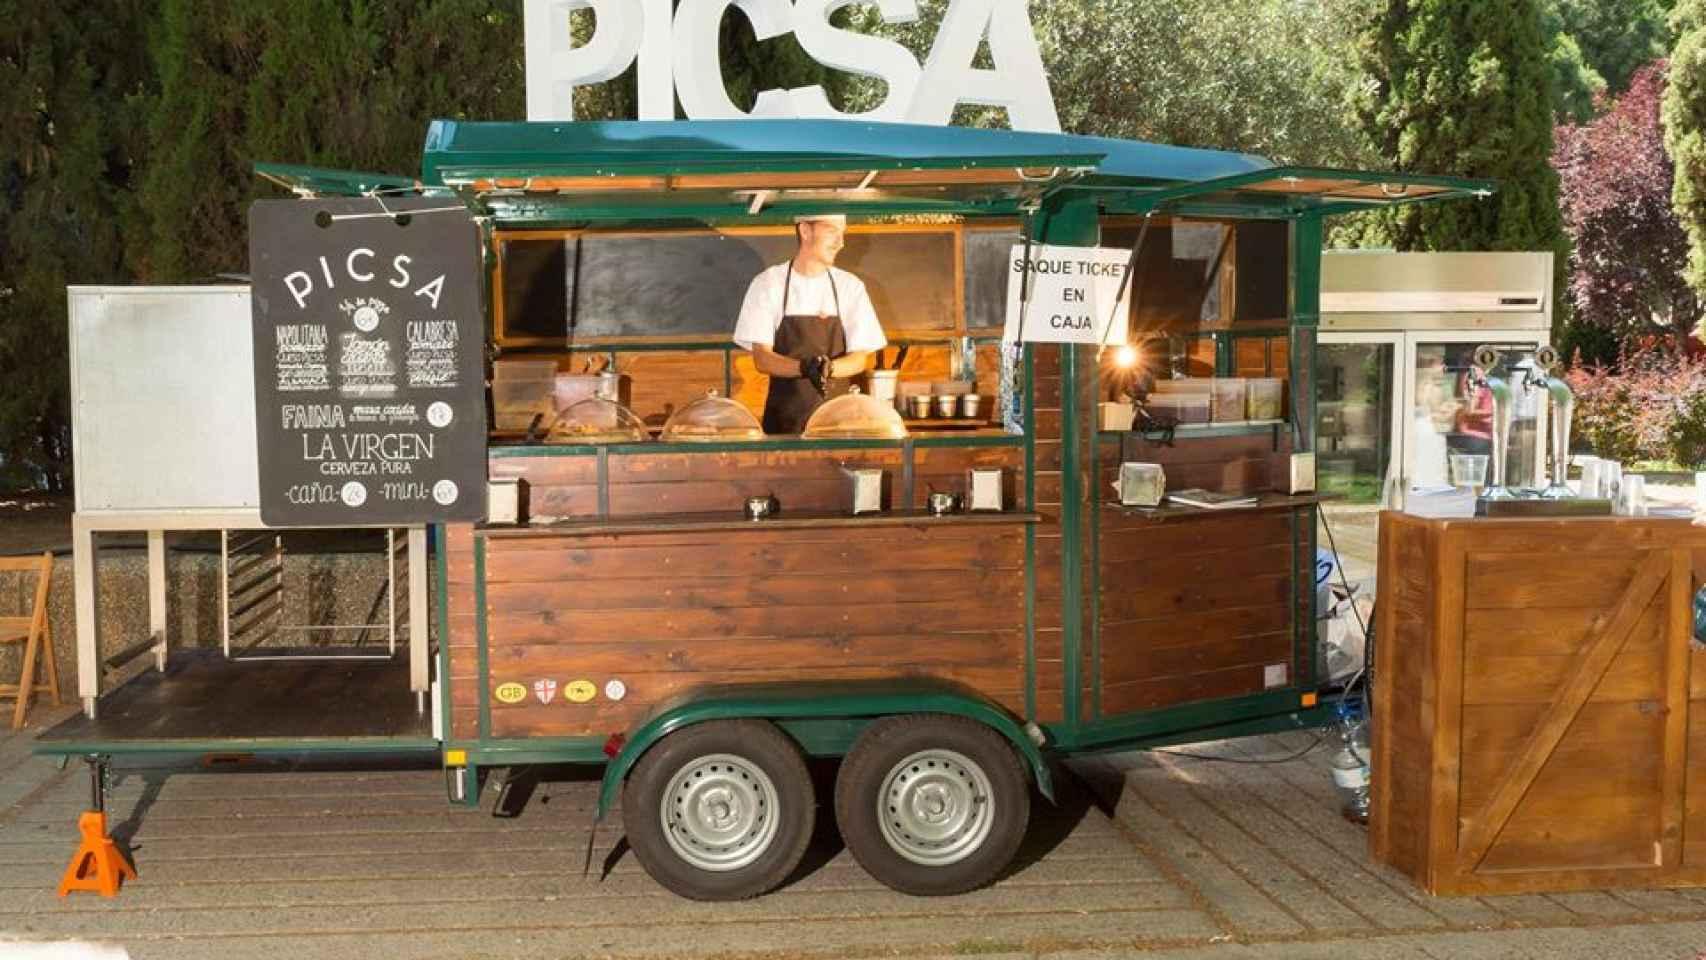 La cocina fusión de Picsa se vuelve itinerante en esta gastroneta.